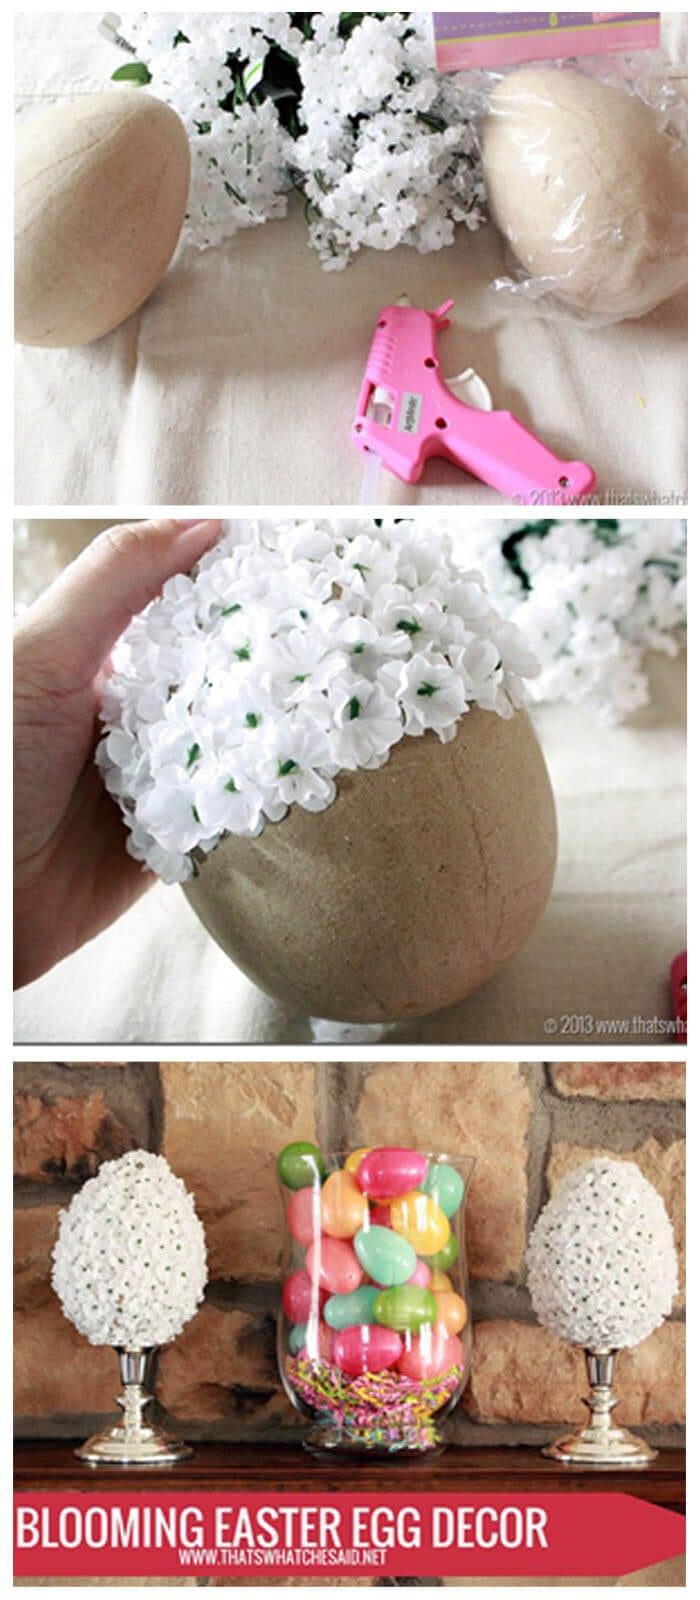 Blooming Easter Egg Decor